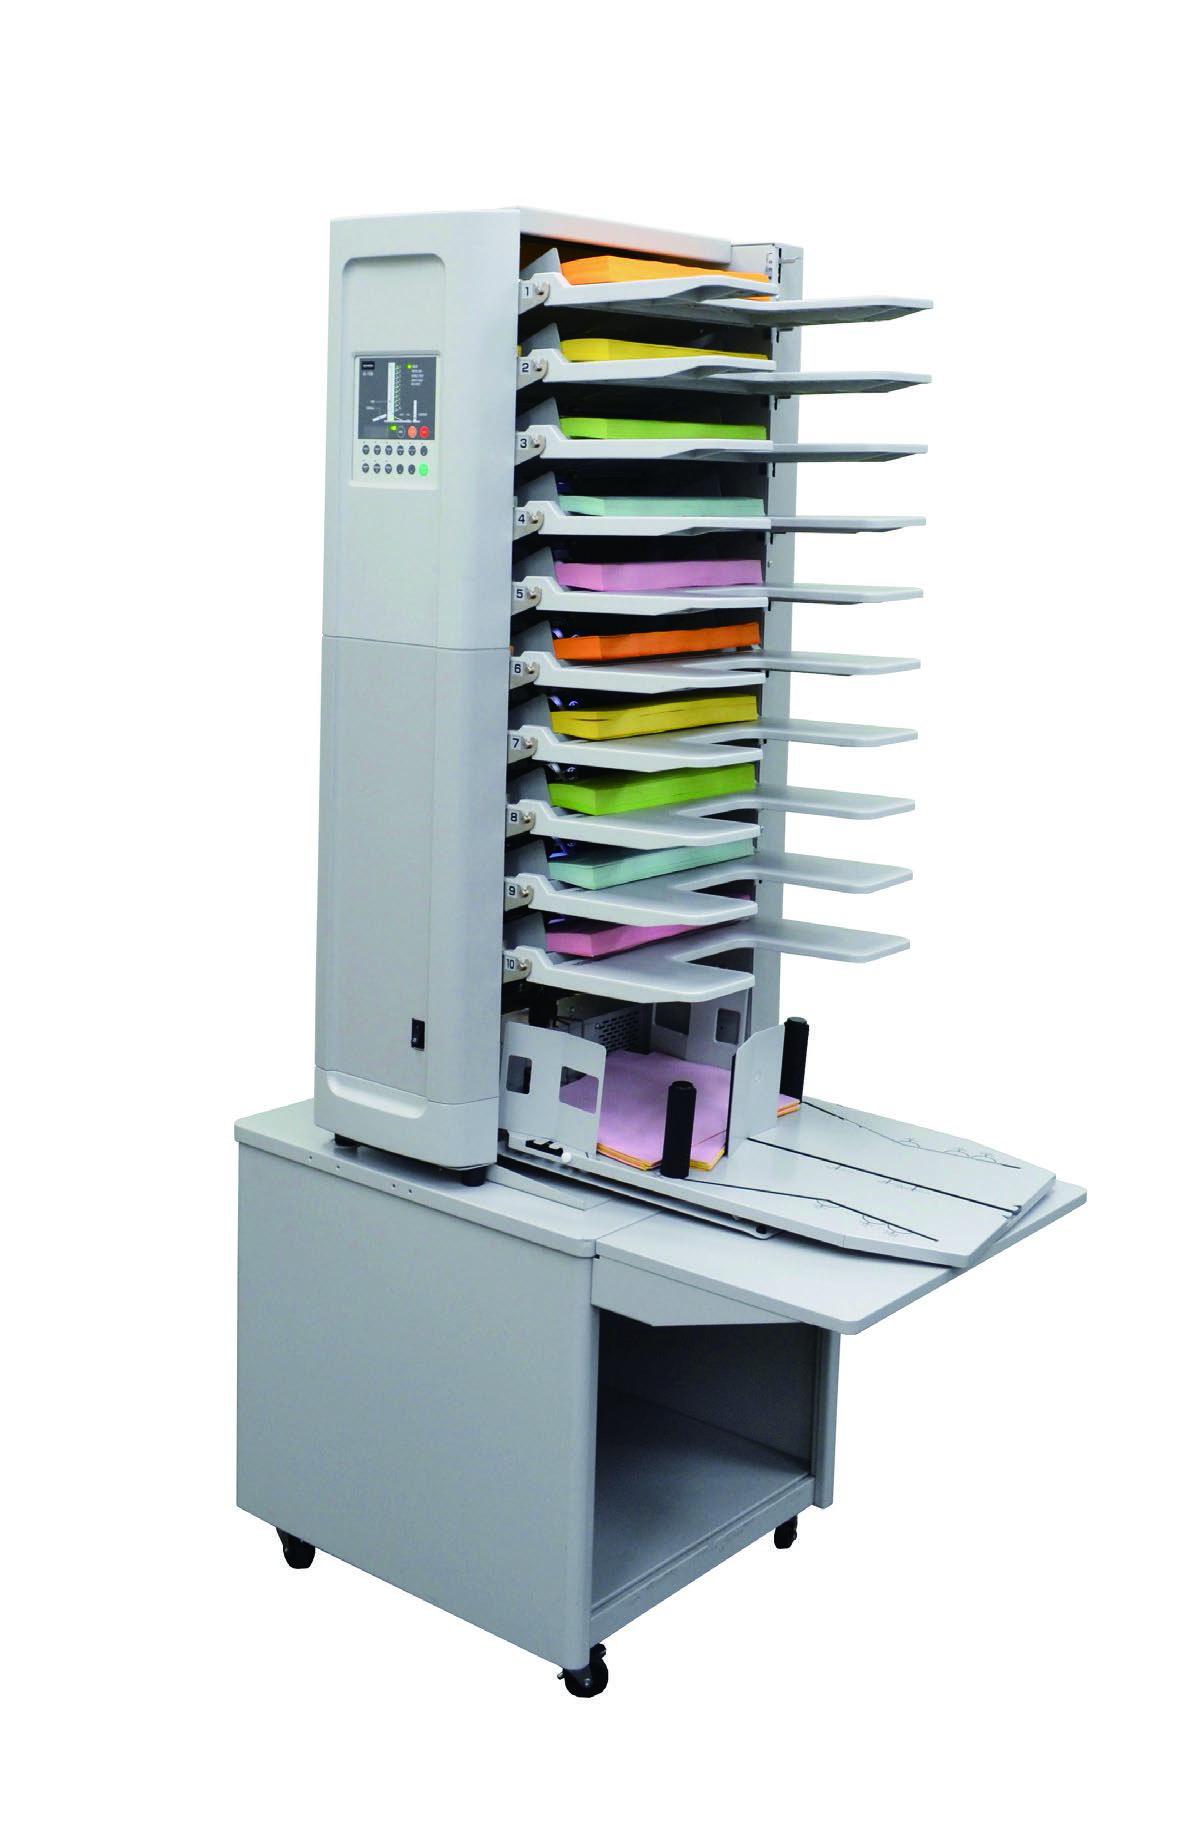 Uchida UC 1200 Automatic Paper Collator